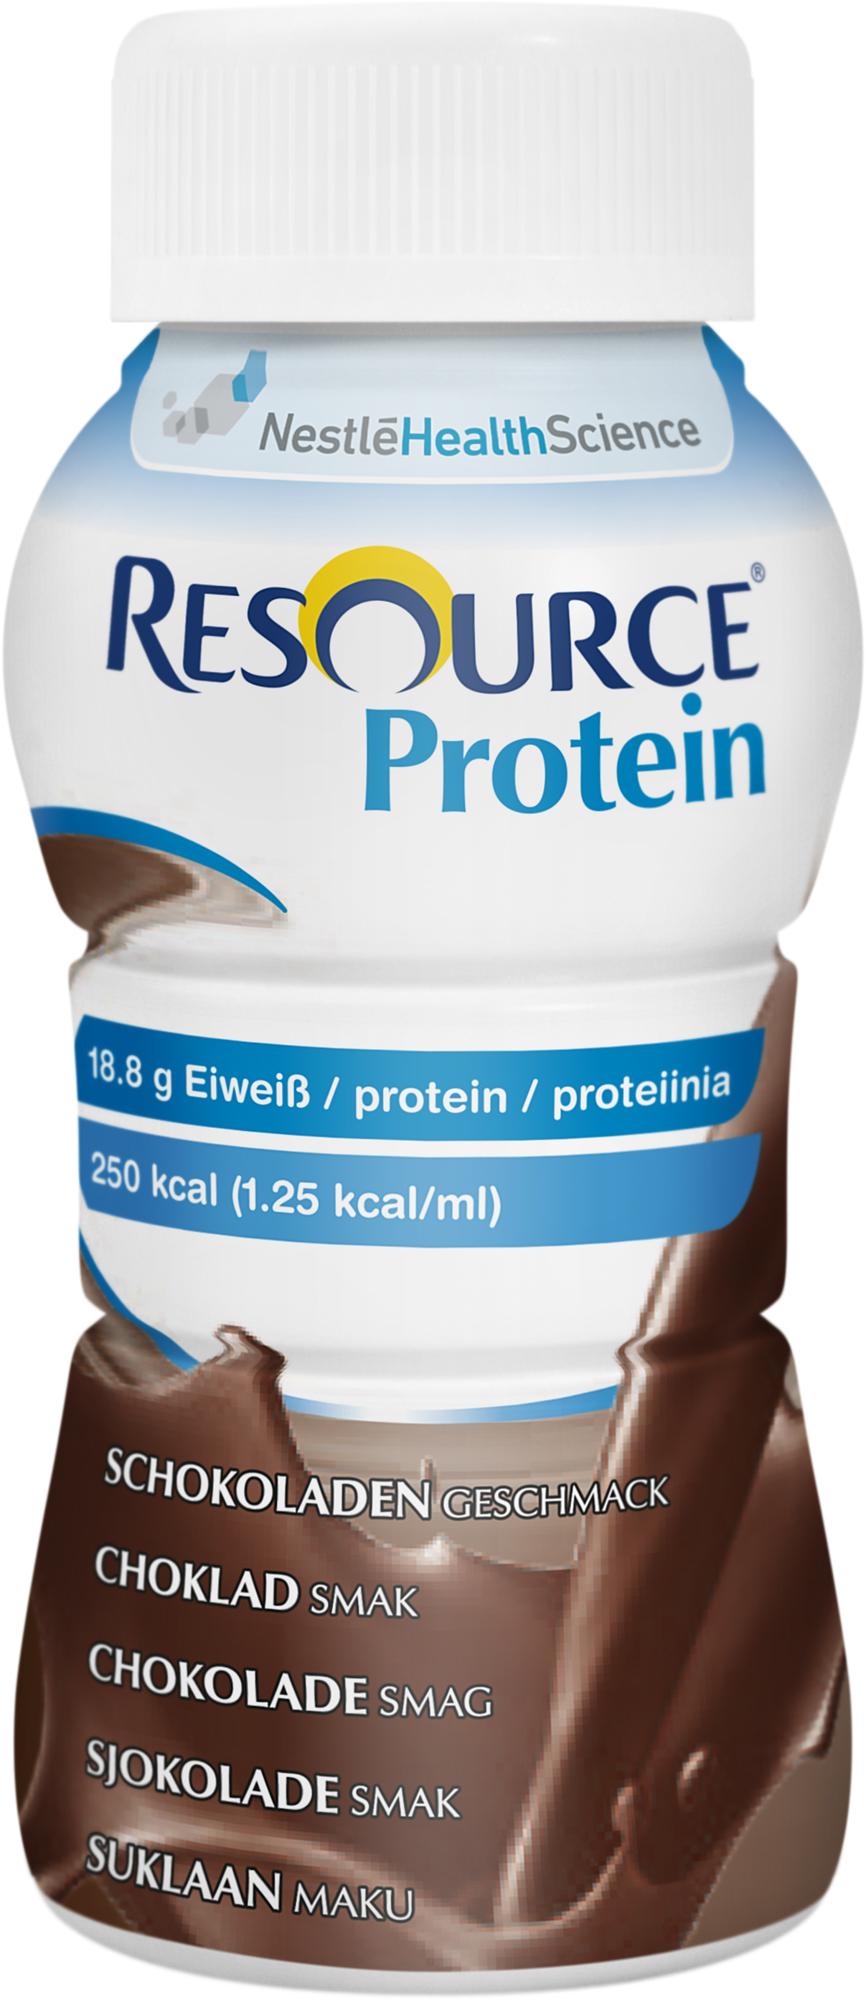 Drikk Resource protein sjokolade 200ml